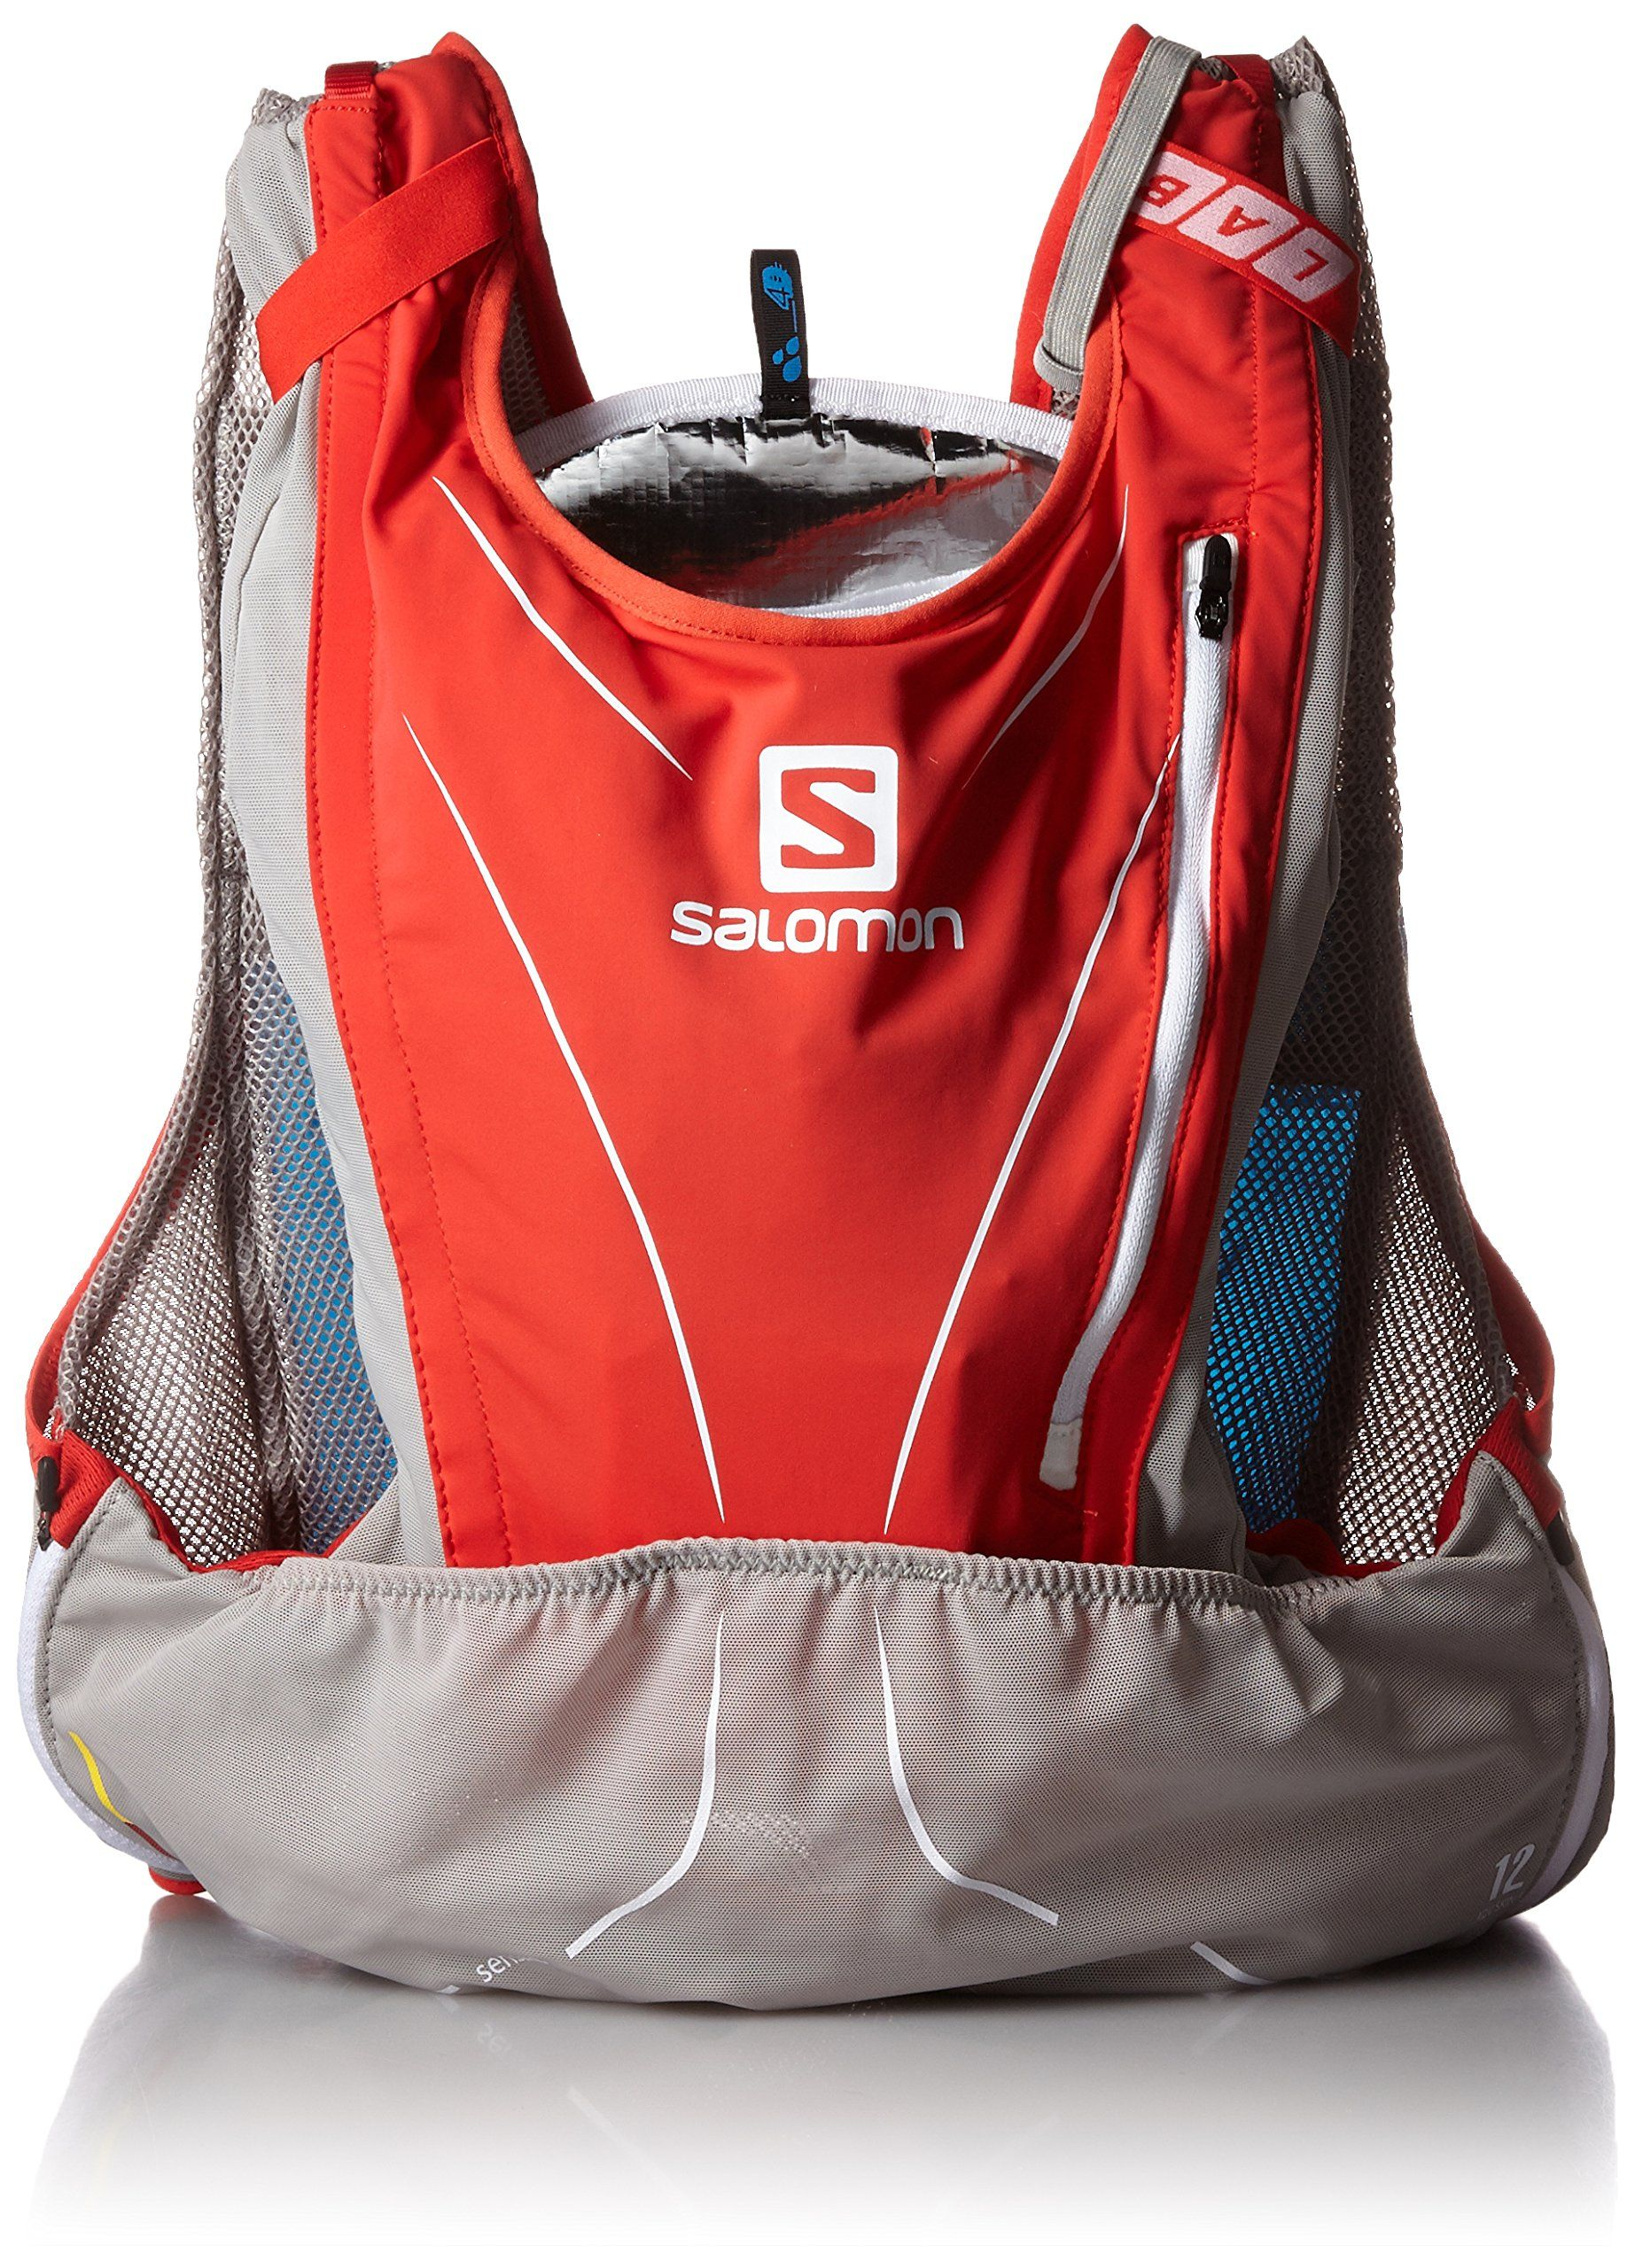 Salomon SLab ADV Skin 12 Set Racing Red / Aluminium M/L